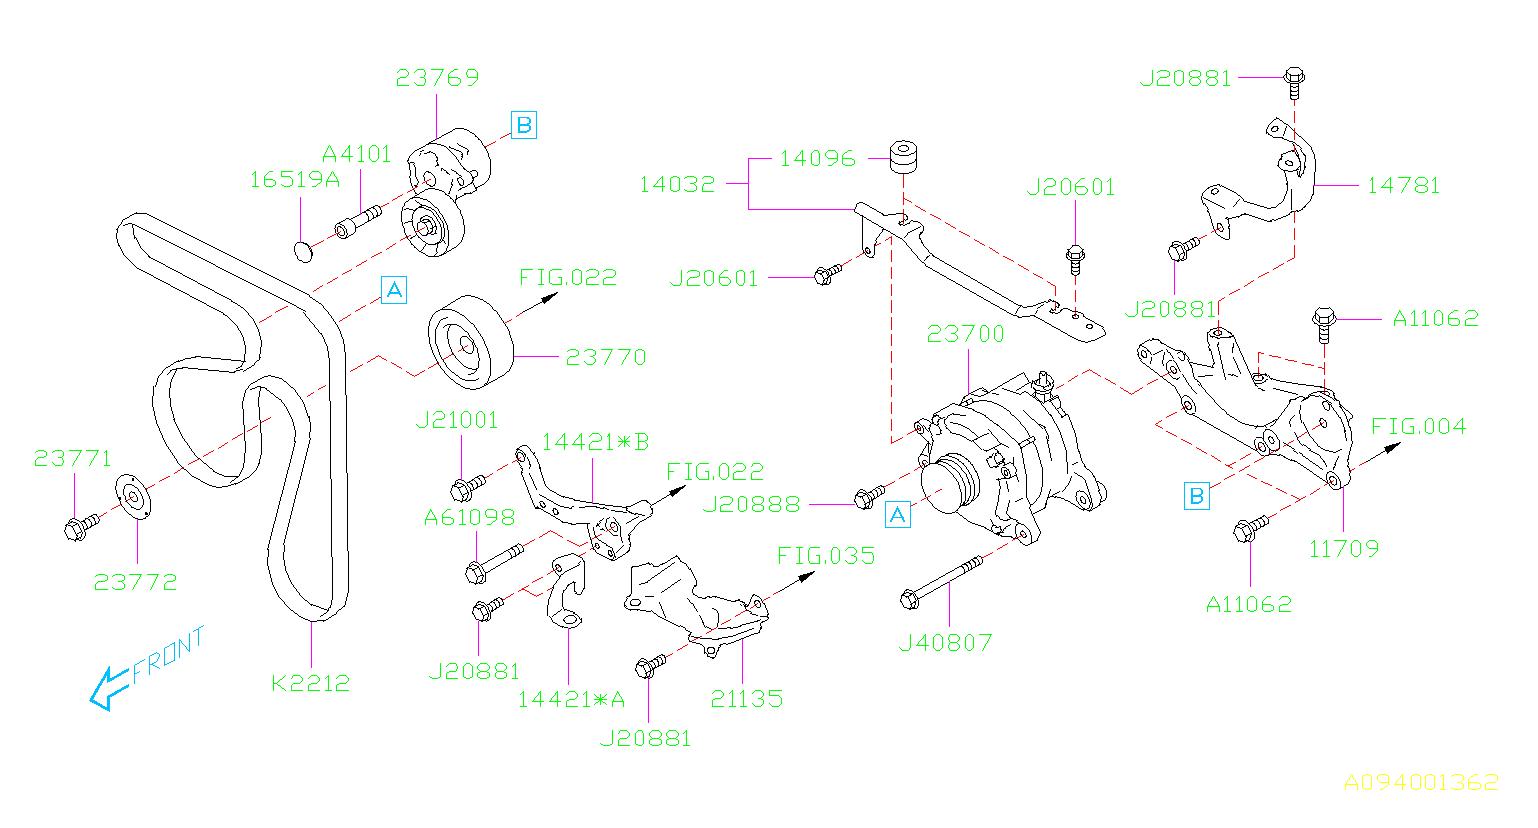 Subaru Forester Alternator  Body  Battery  System - 23700ab030